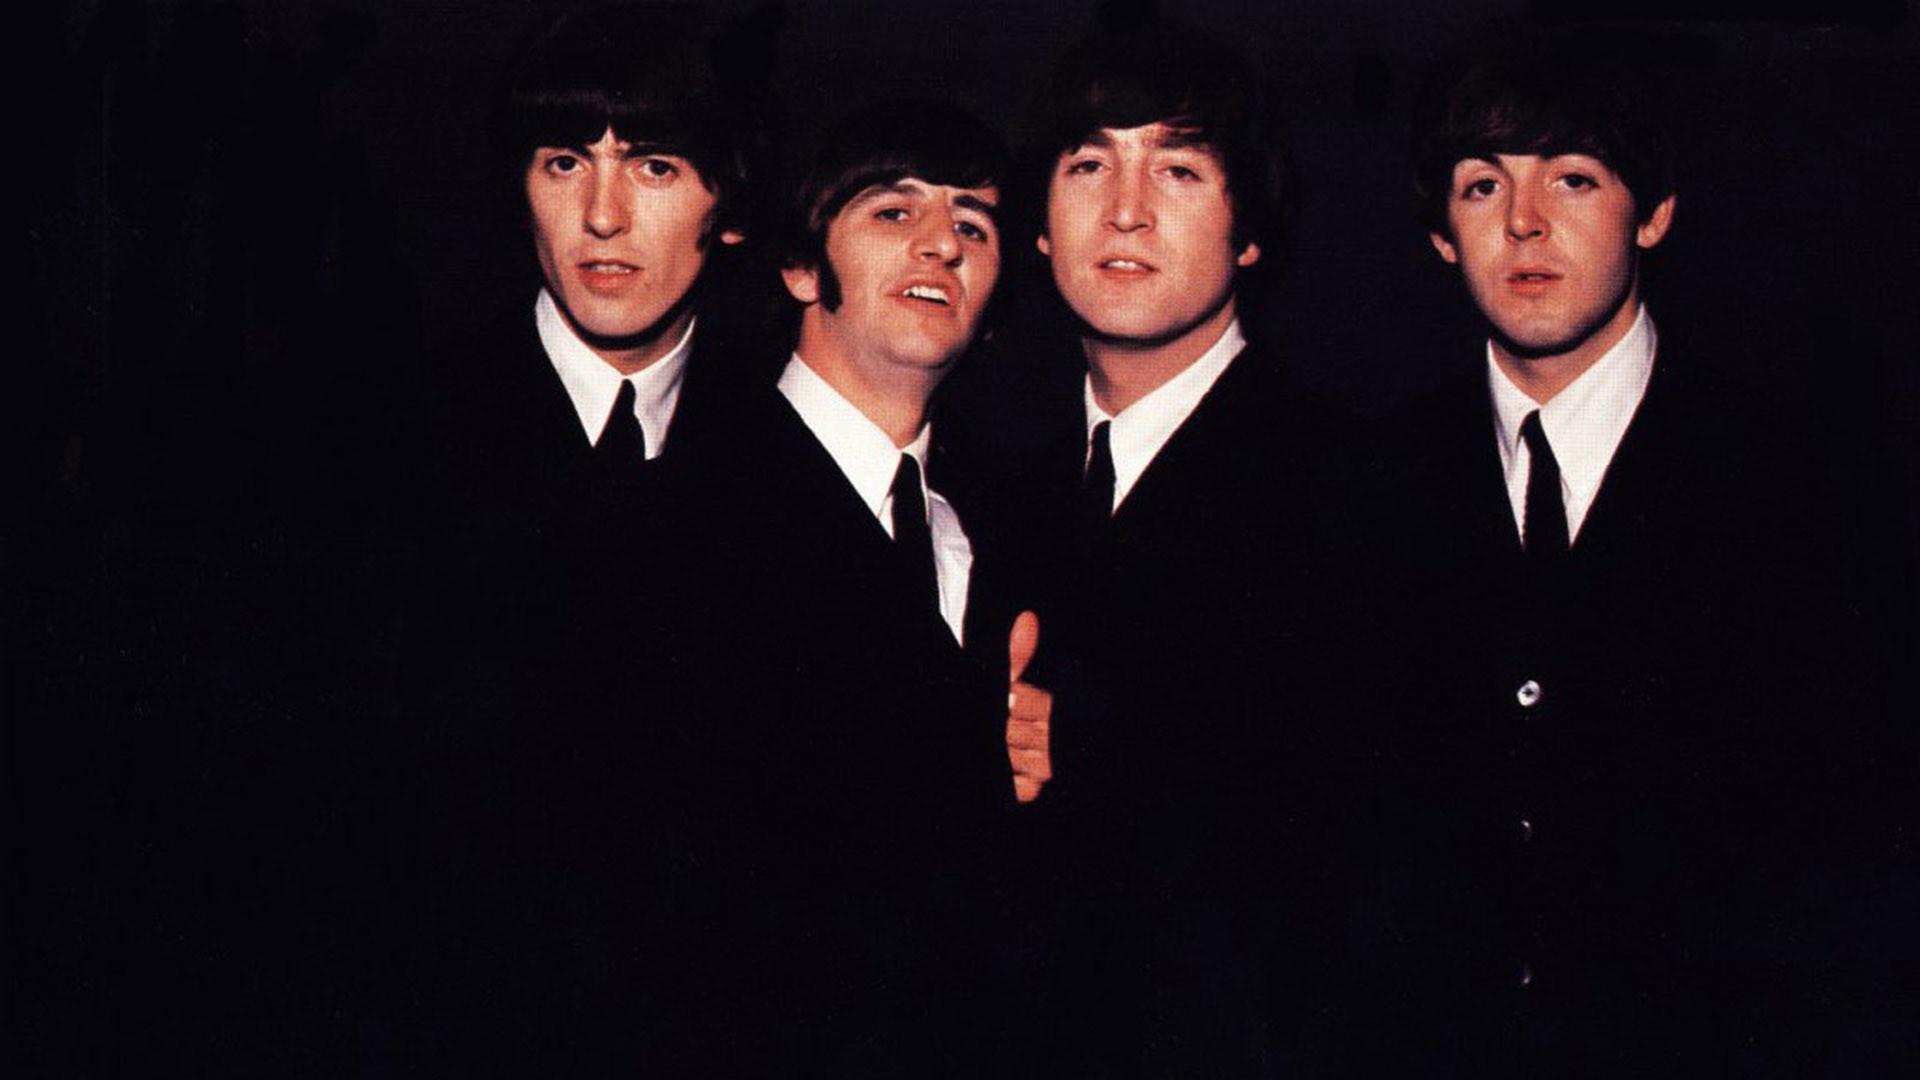 Beatles Desktop Wallpaper 66 Images